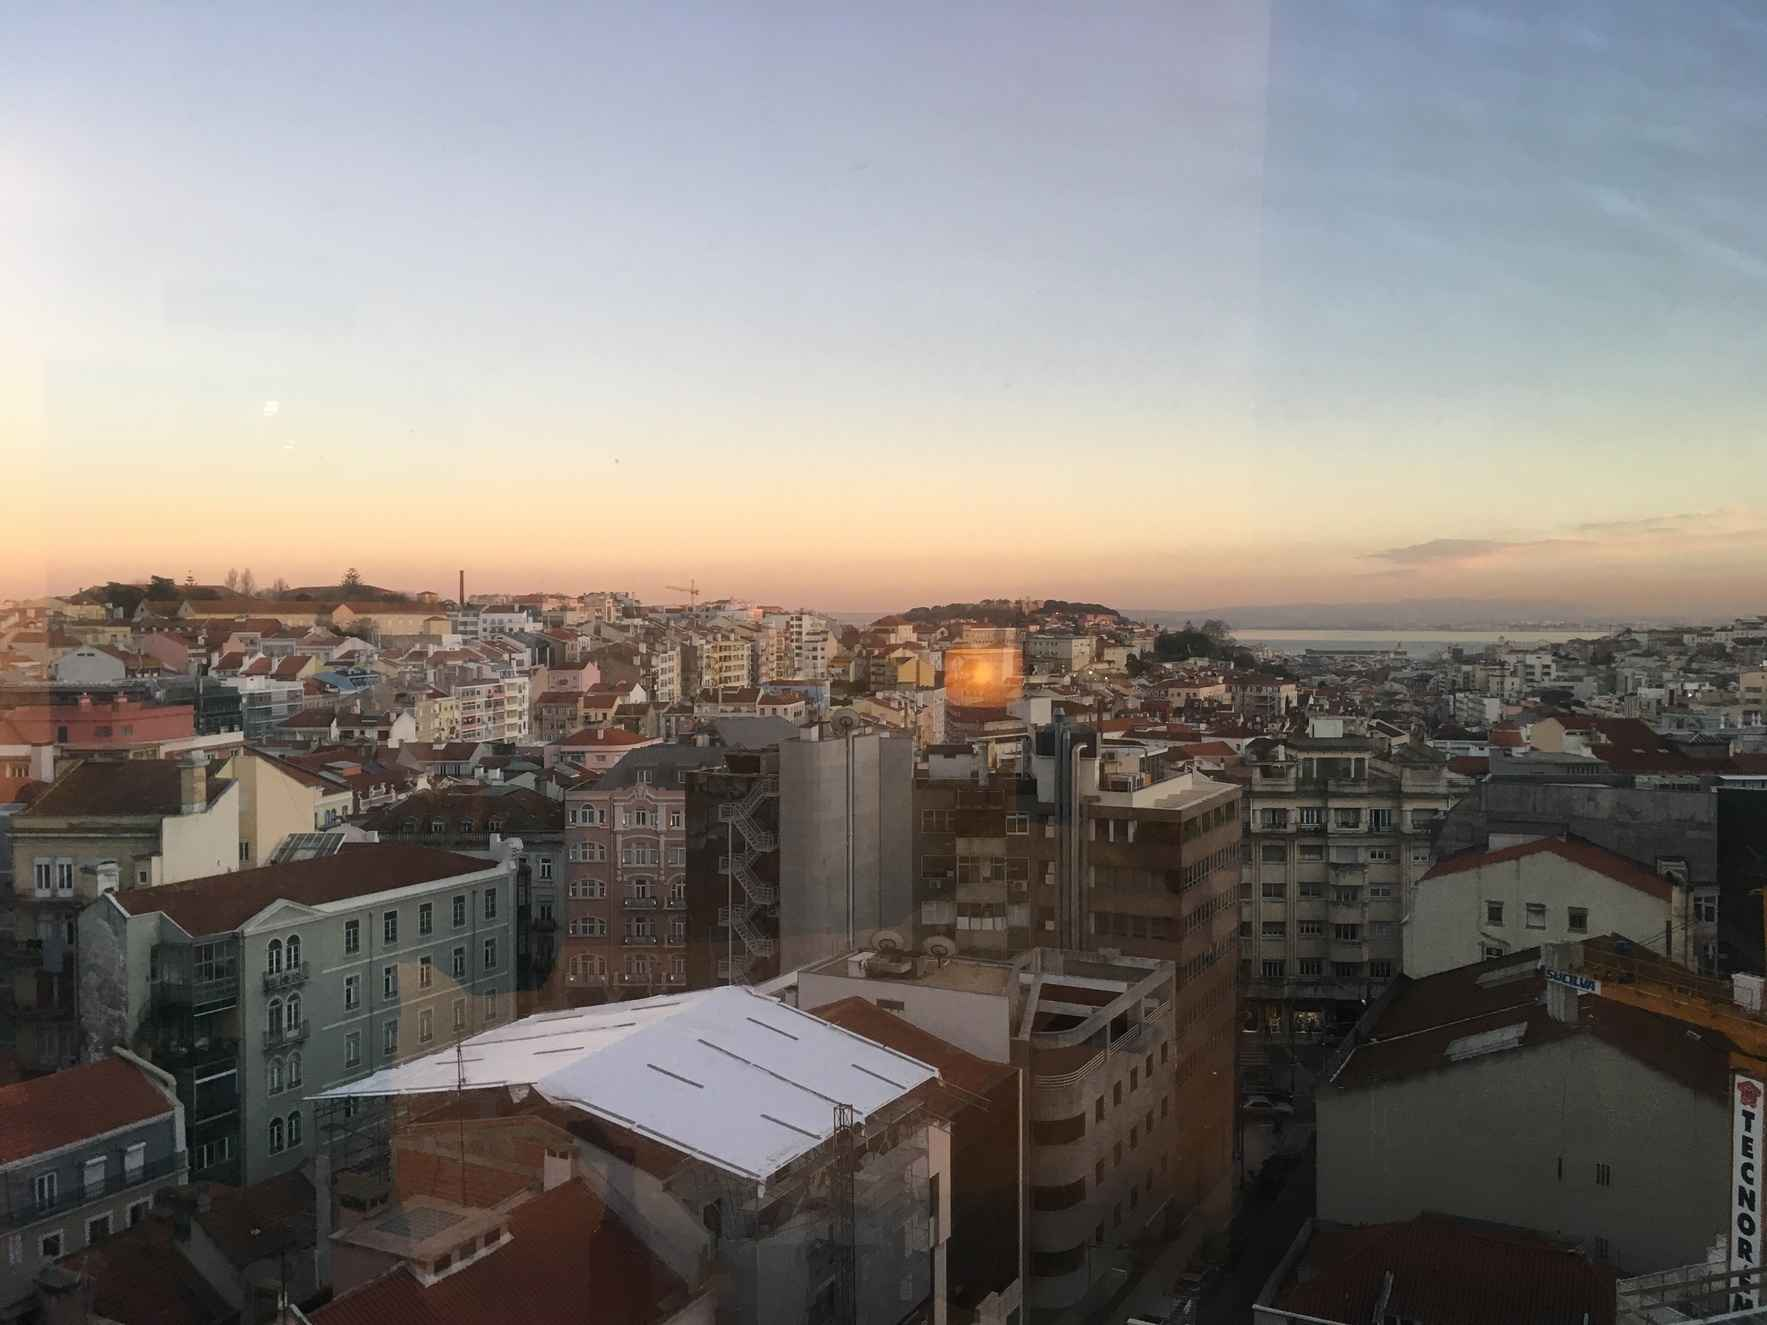 International Council of B'nai B'rith Meeting in Lisbon, Portugal image